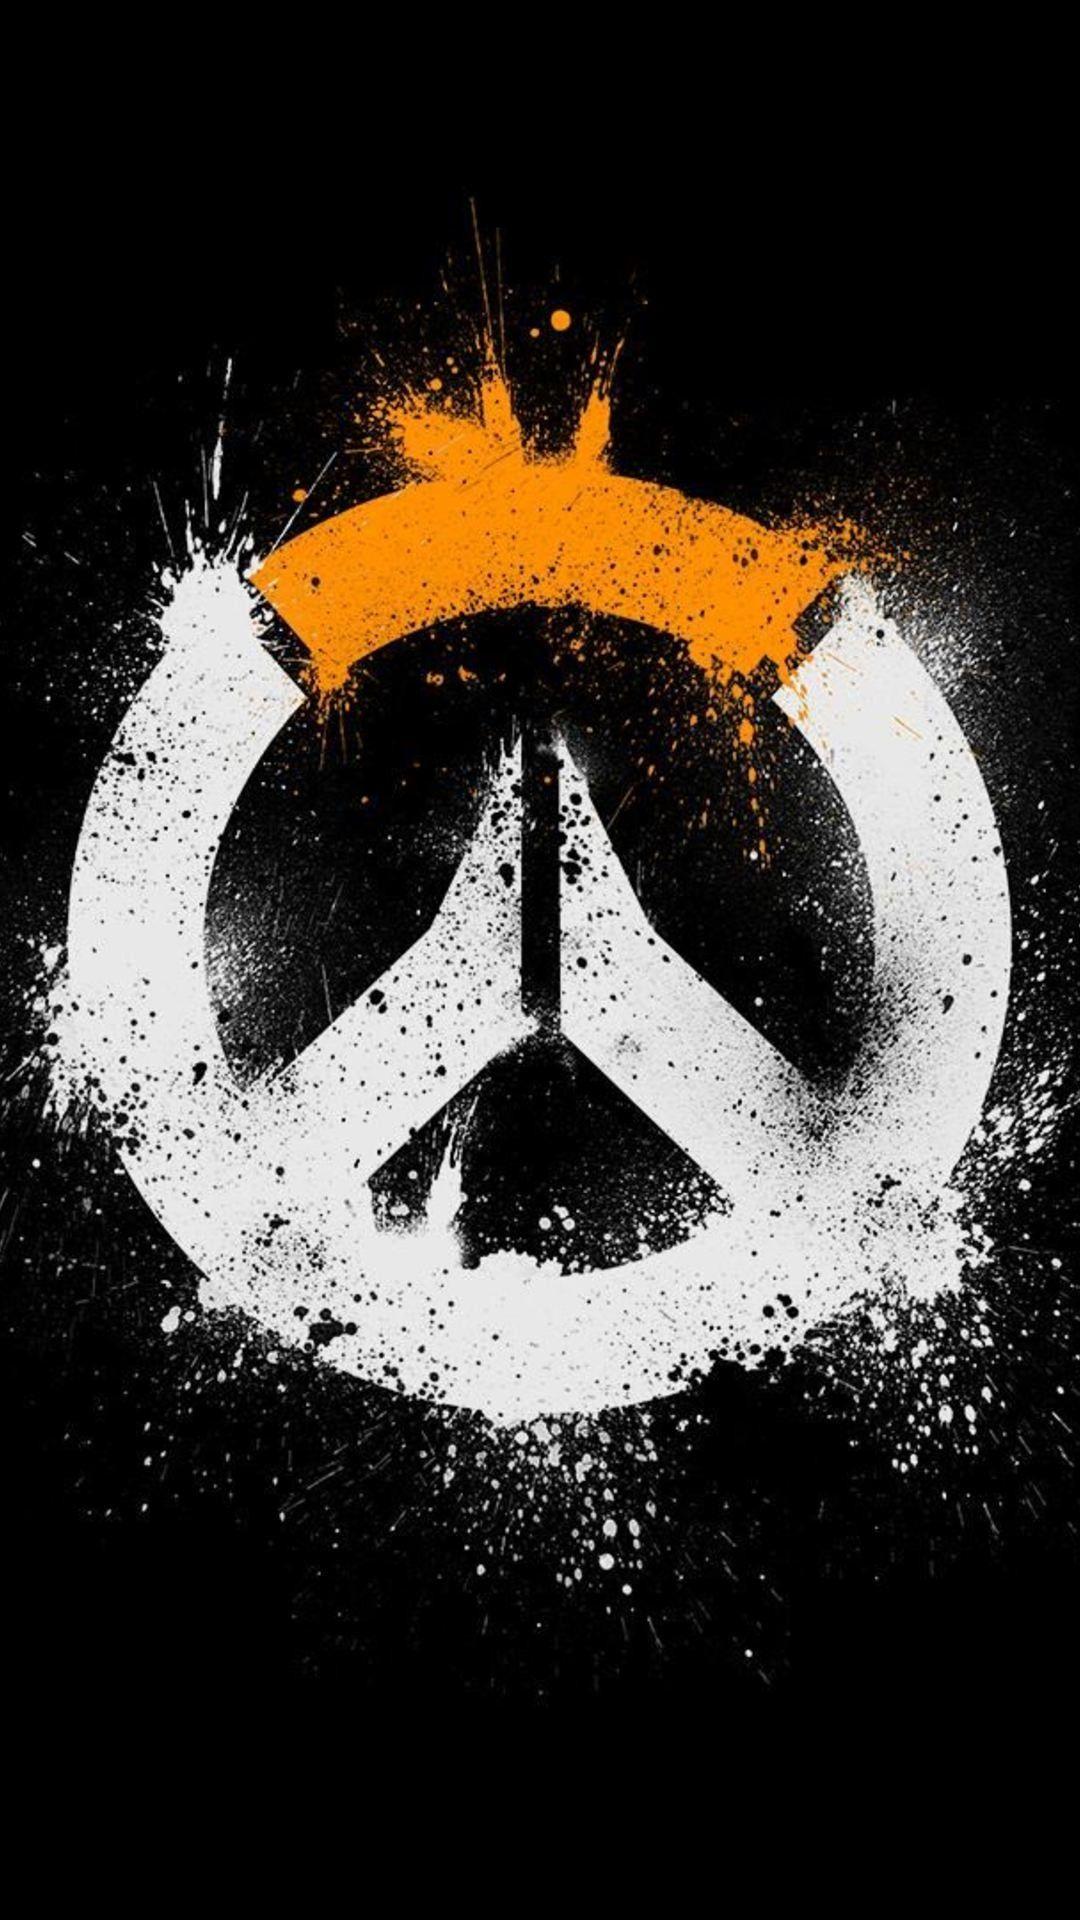 Overwatch Logo Hd Pic Wallpaper 1080x1920 Overwatch